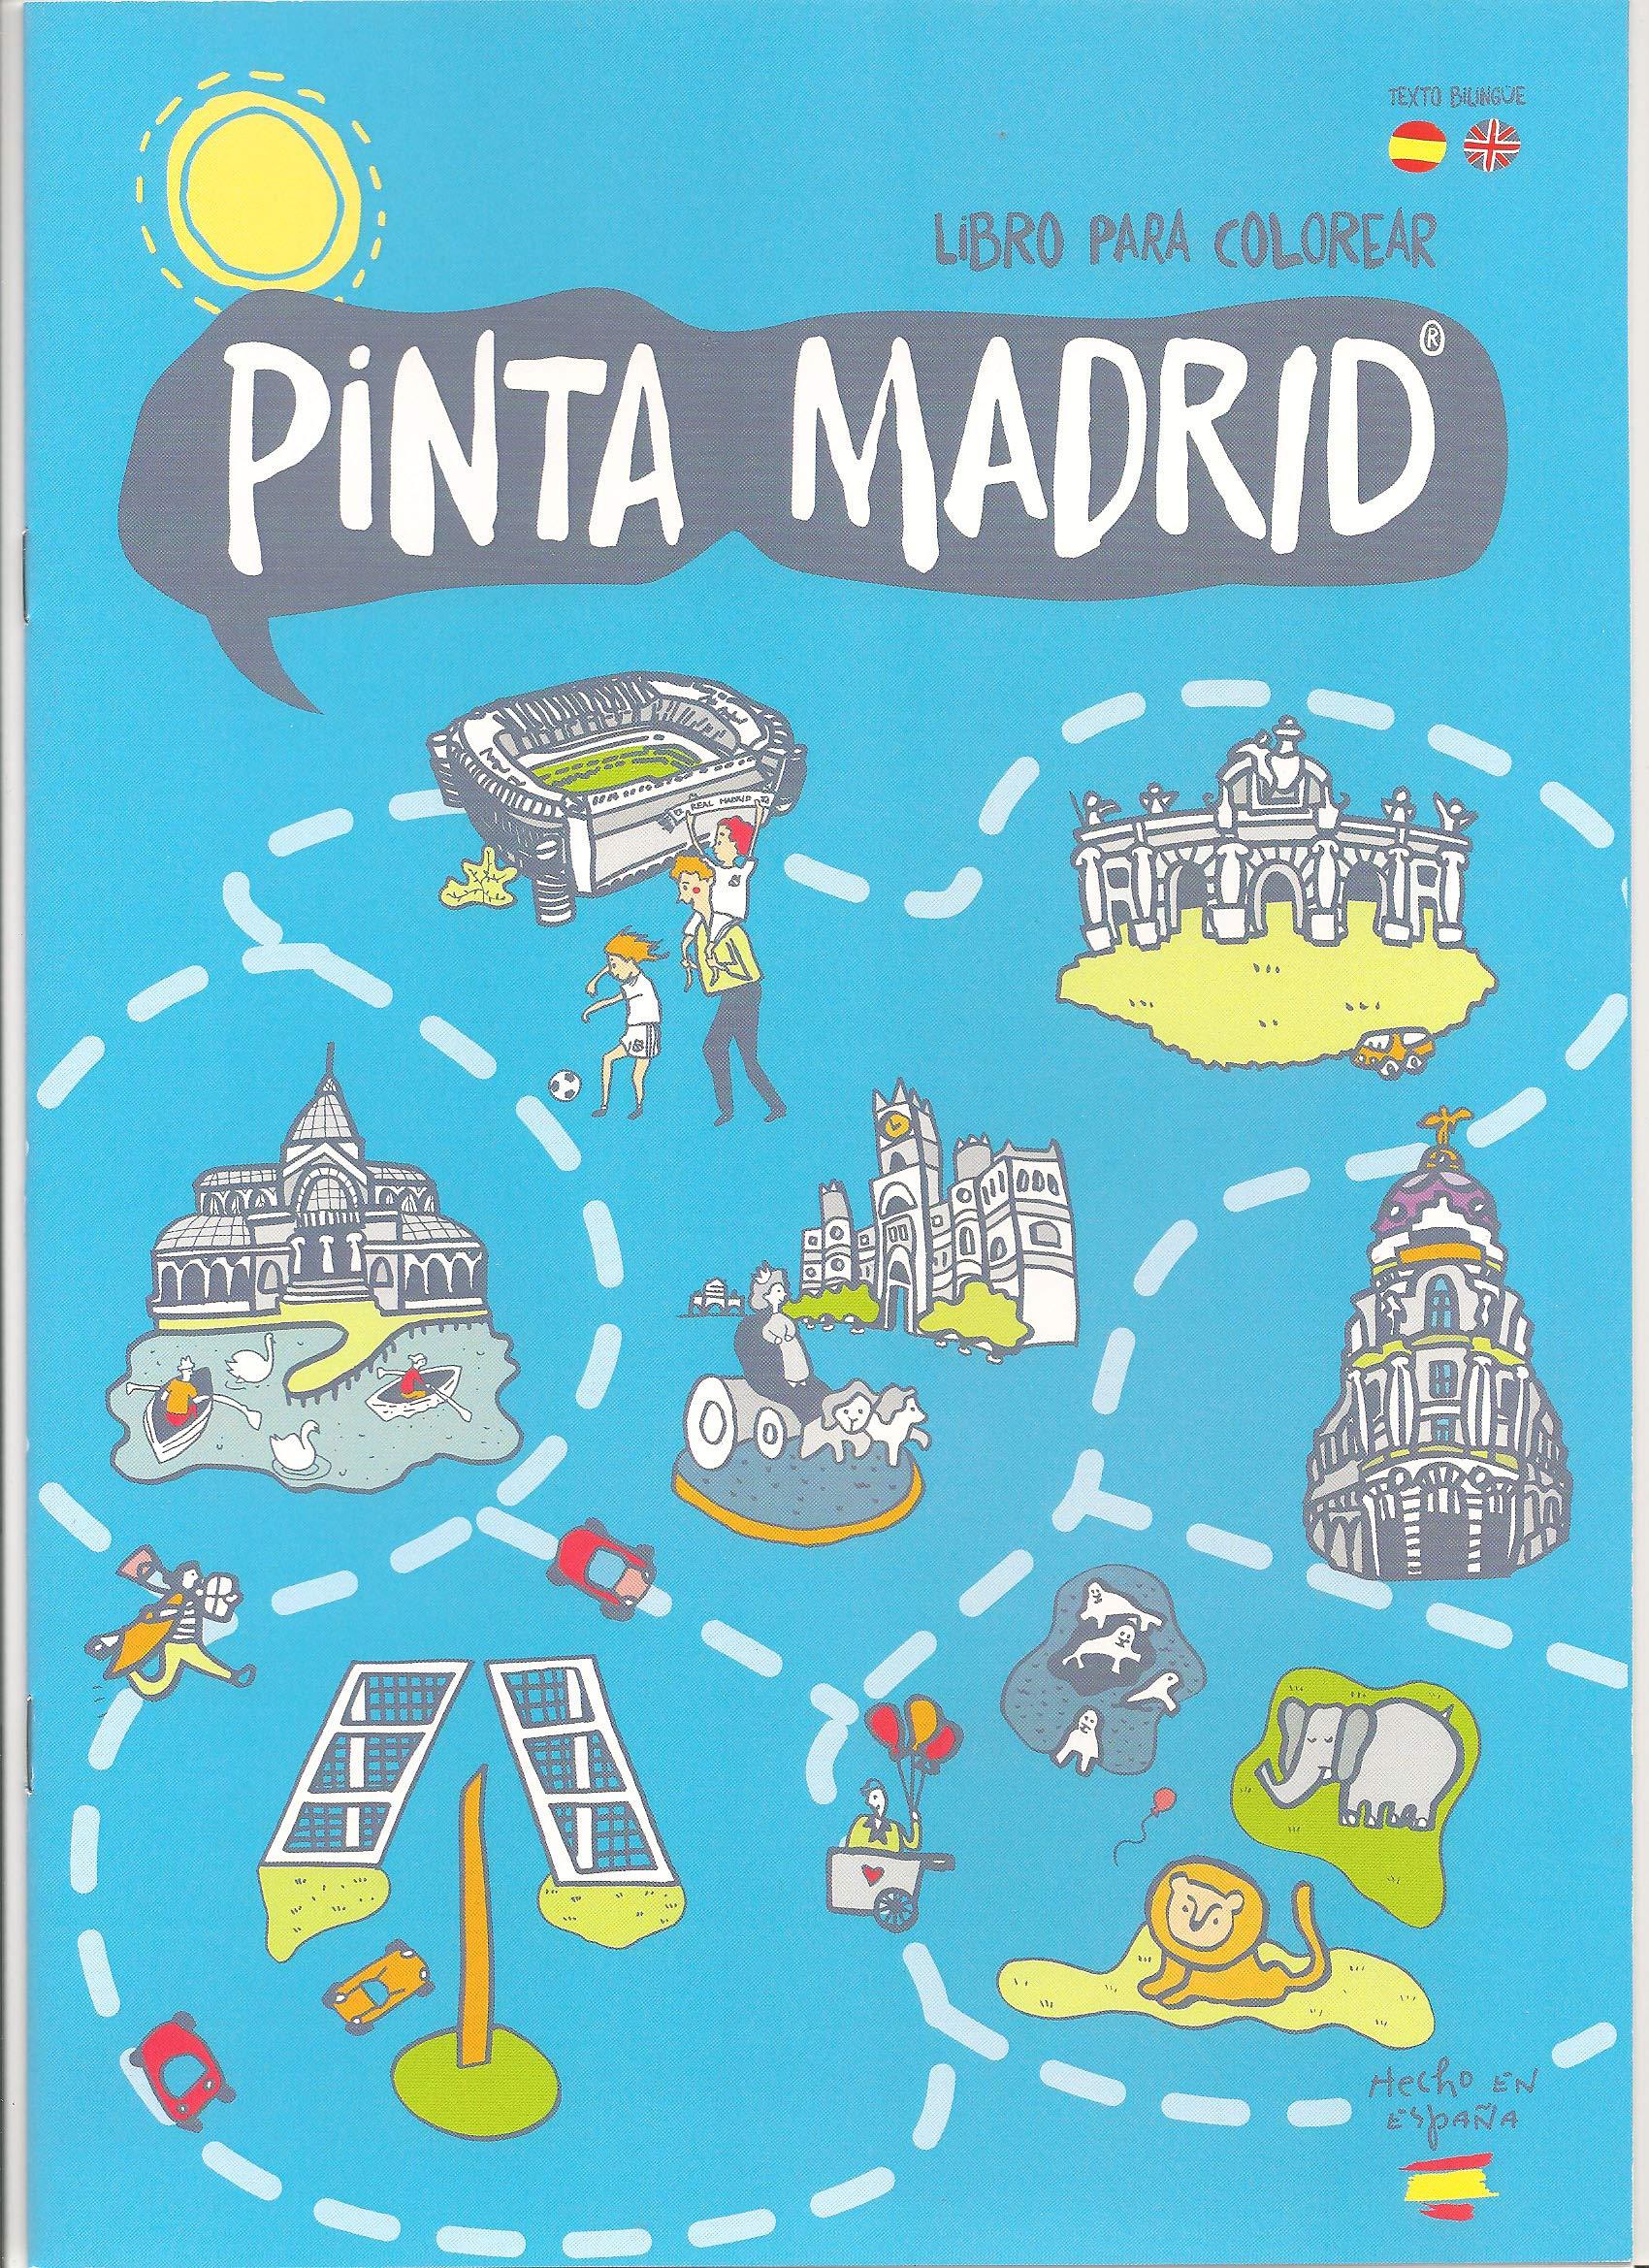 Pinta Madrid: Amazon.es: Oscar Sanchez Martin, Mercedes diaz Villarías: Libros